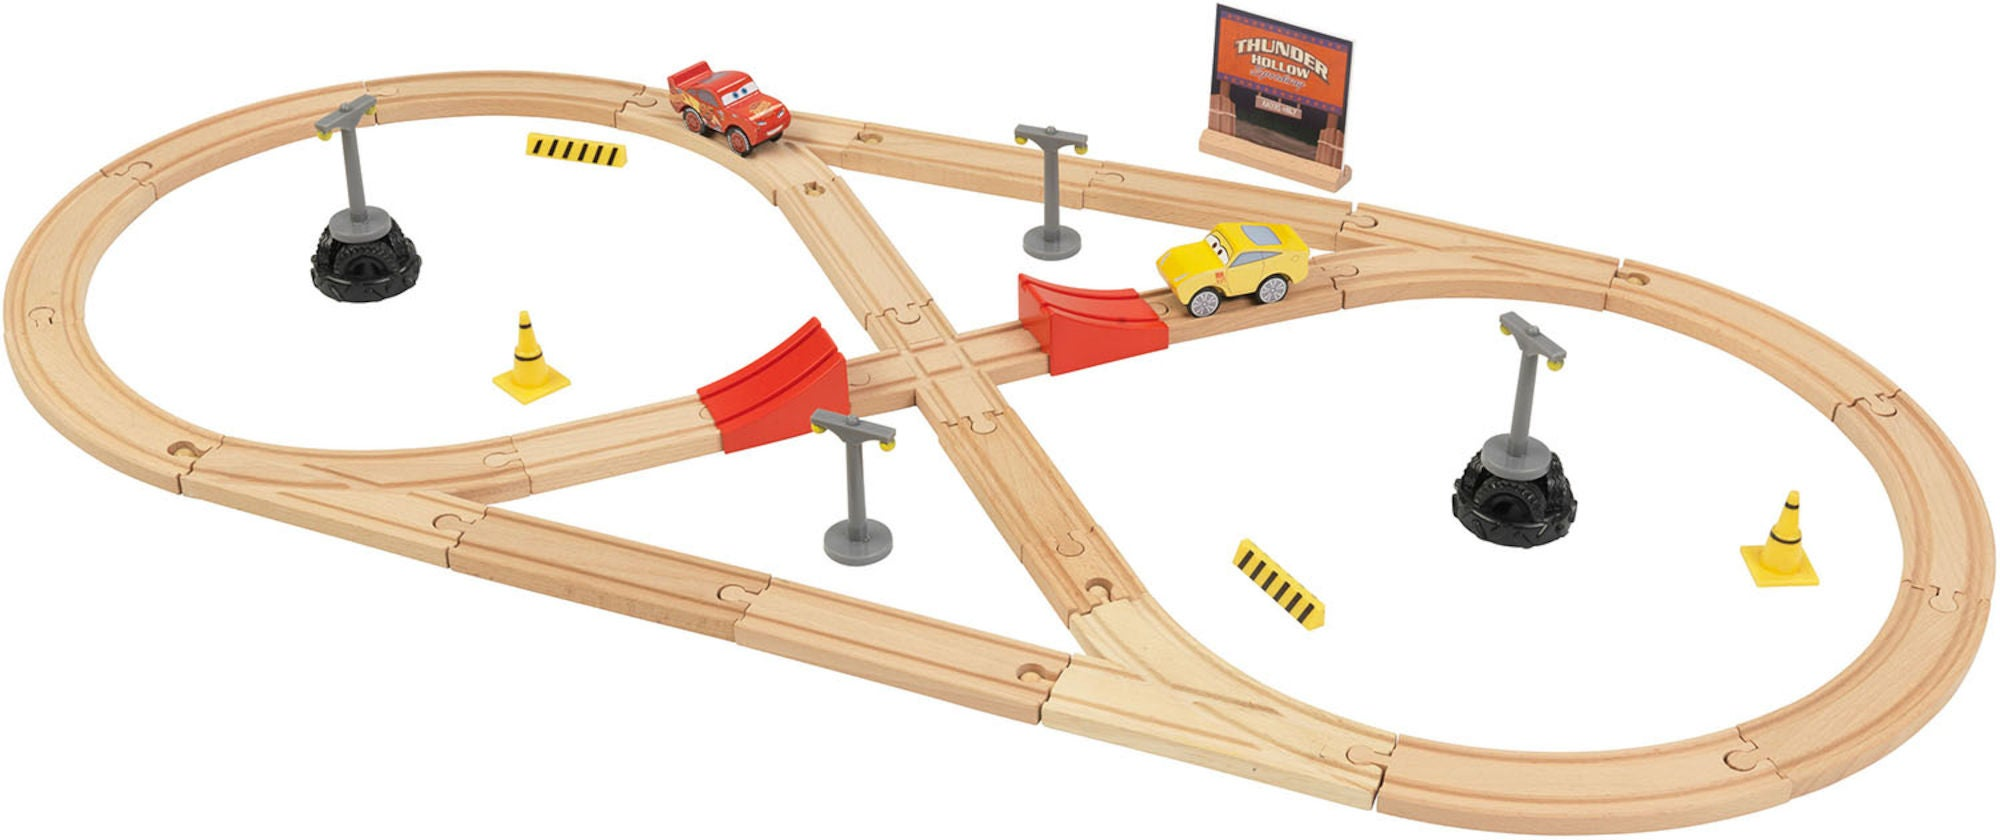 Disney Cars 3 Bygg Din Egen Tågbana